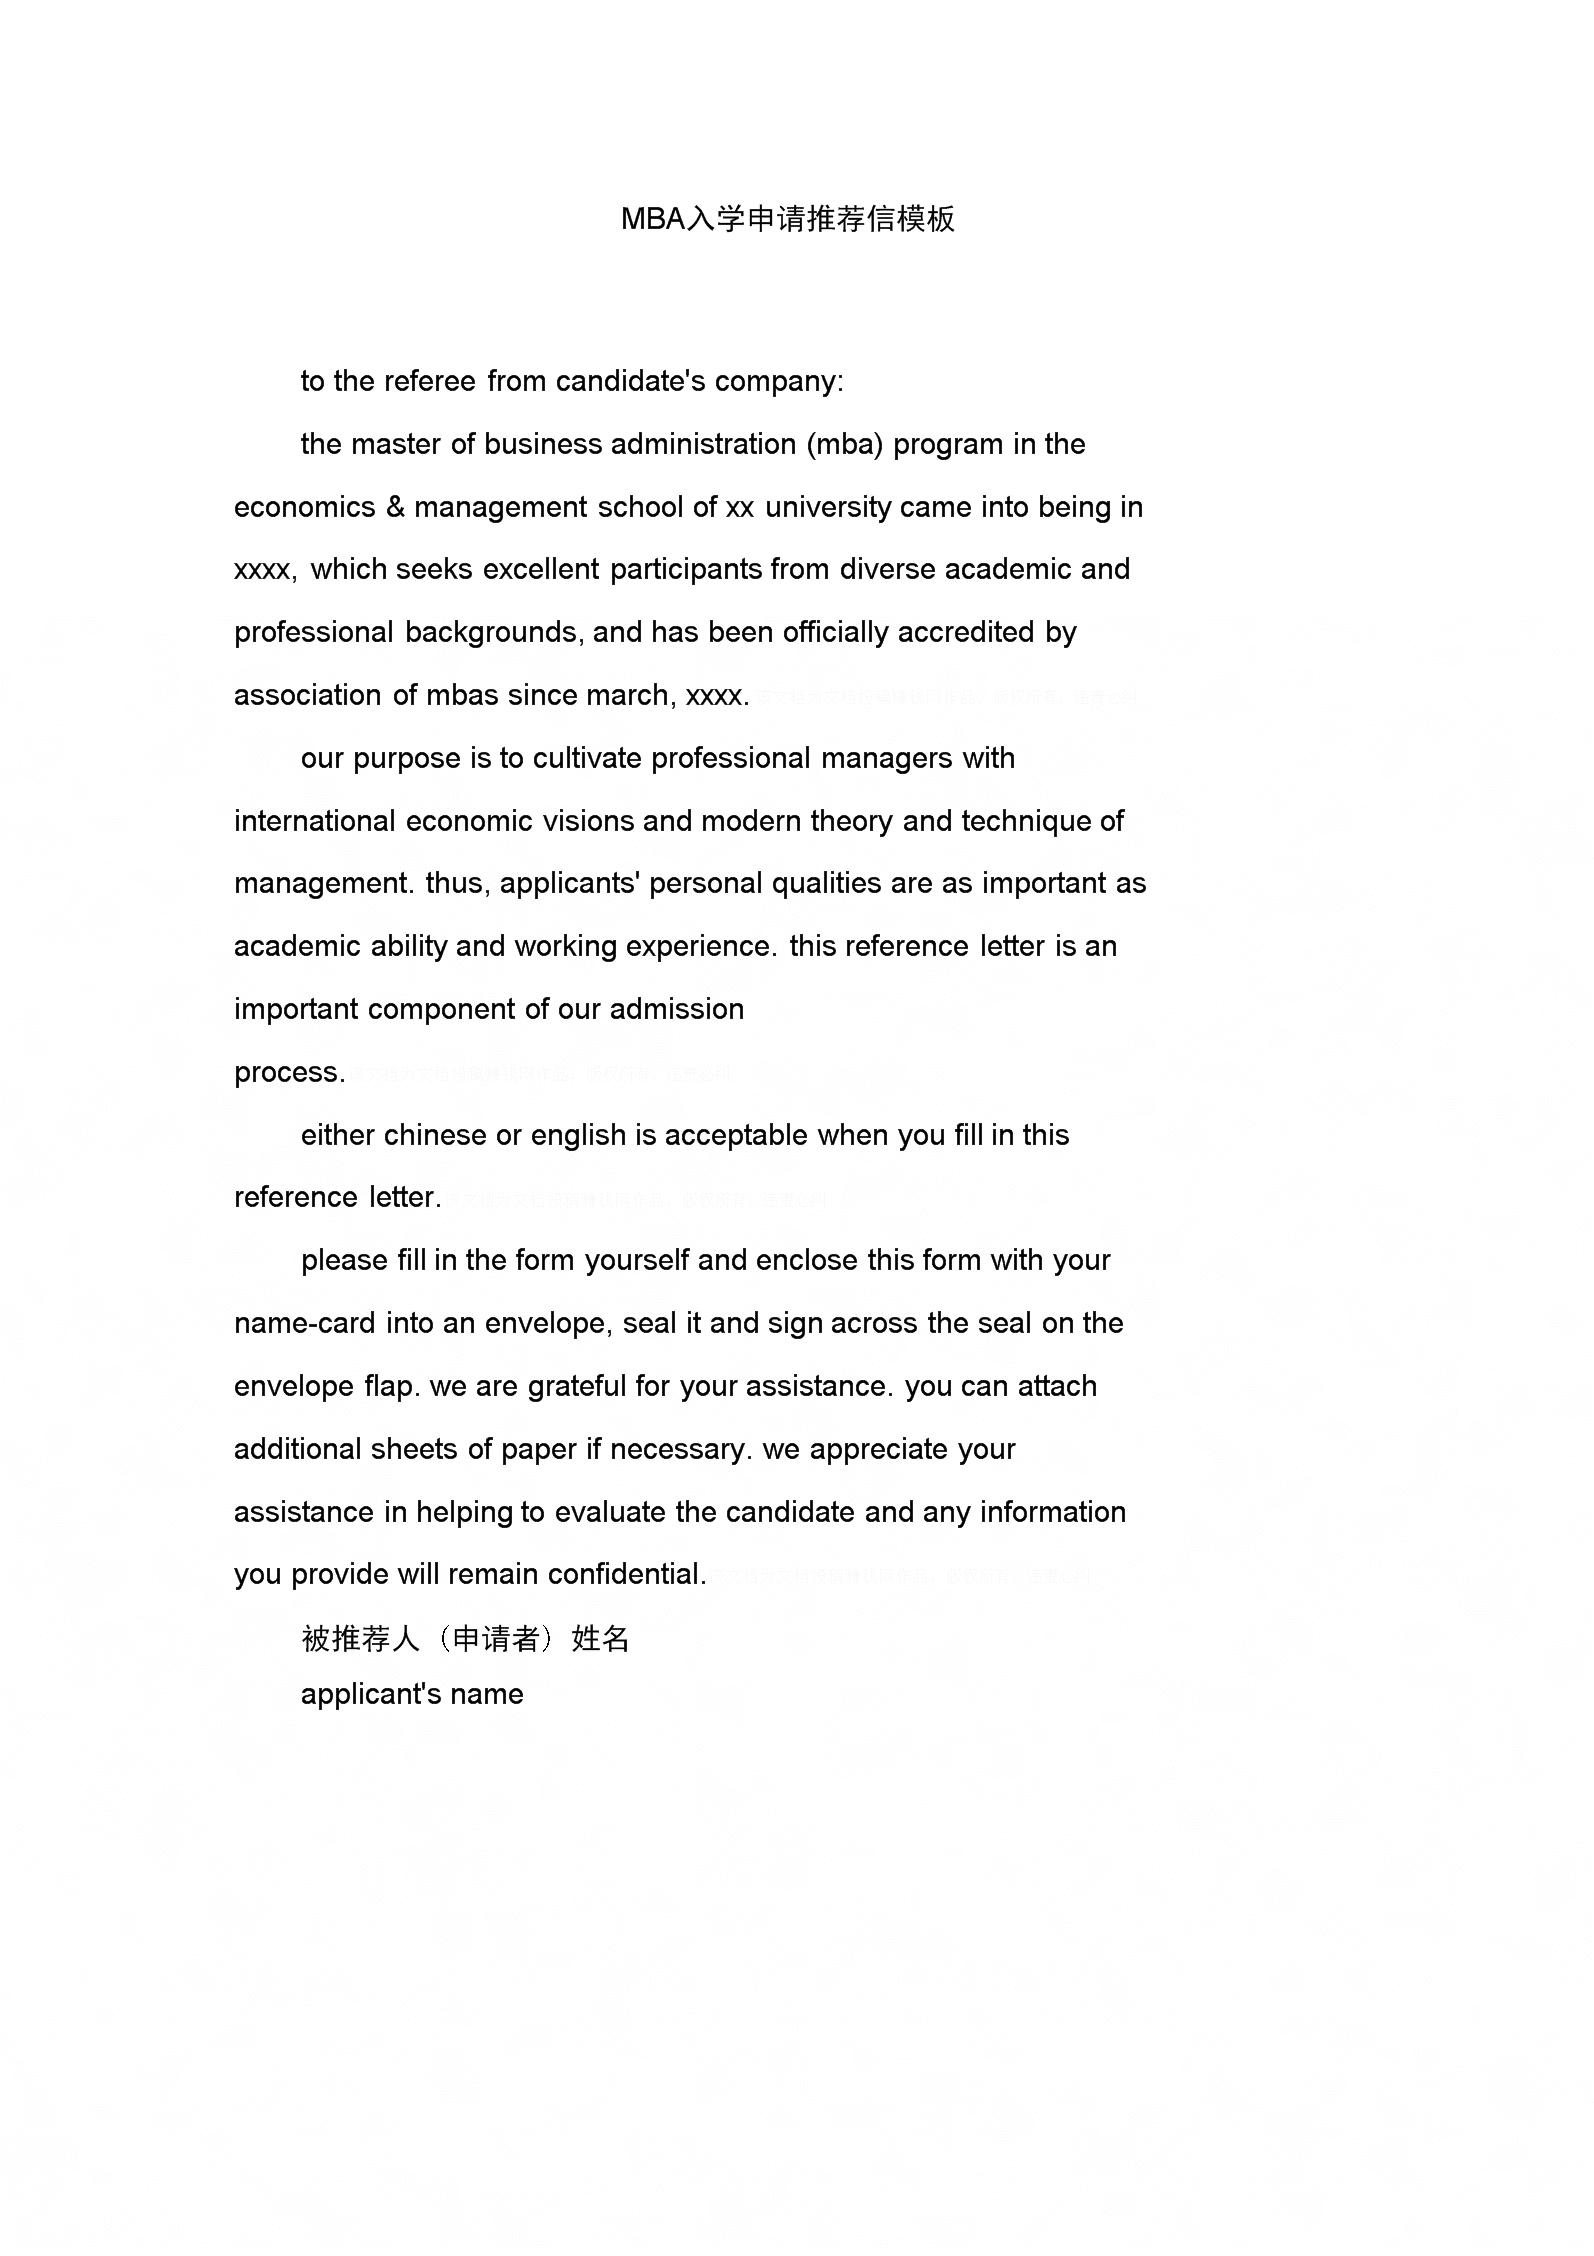 MBA入學申請推薦信模板.docx